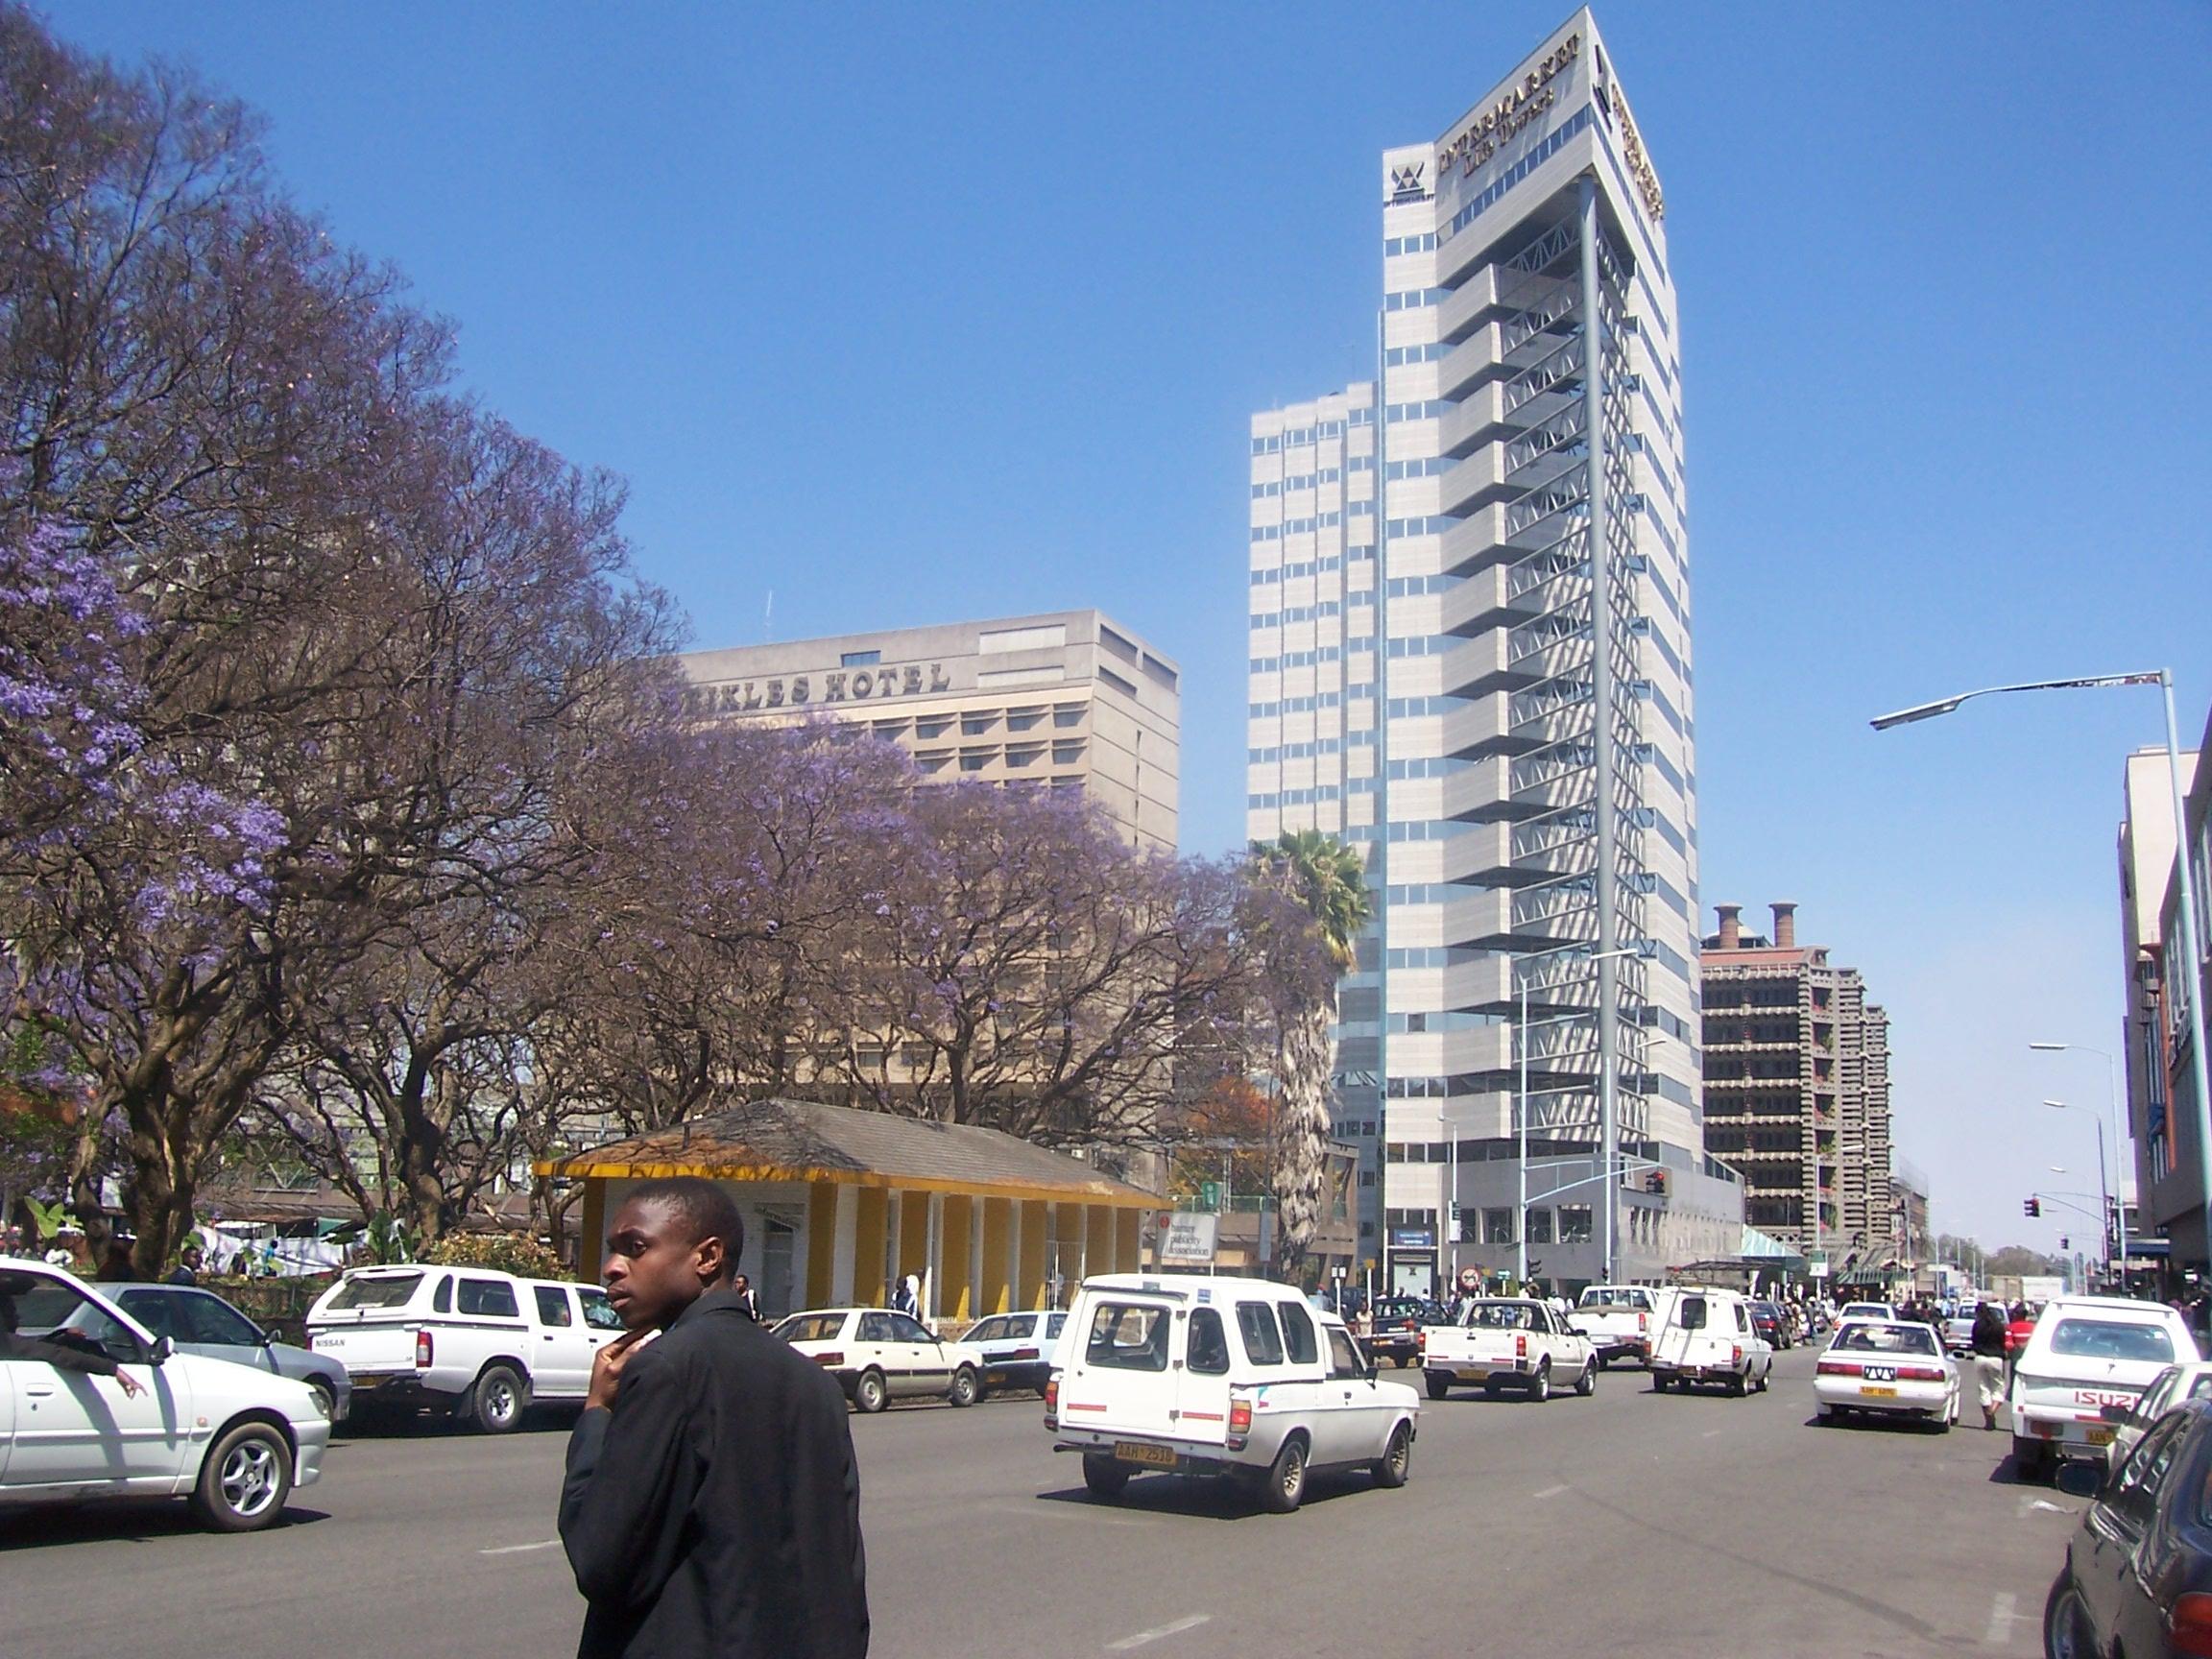 Zimbabwe's economy - Investors King